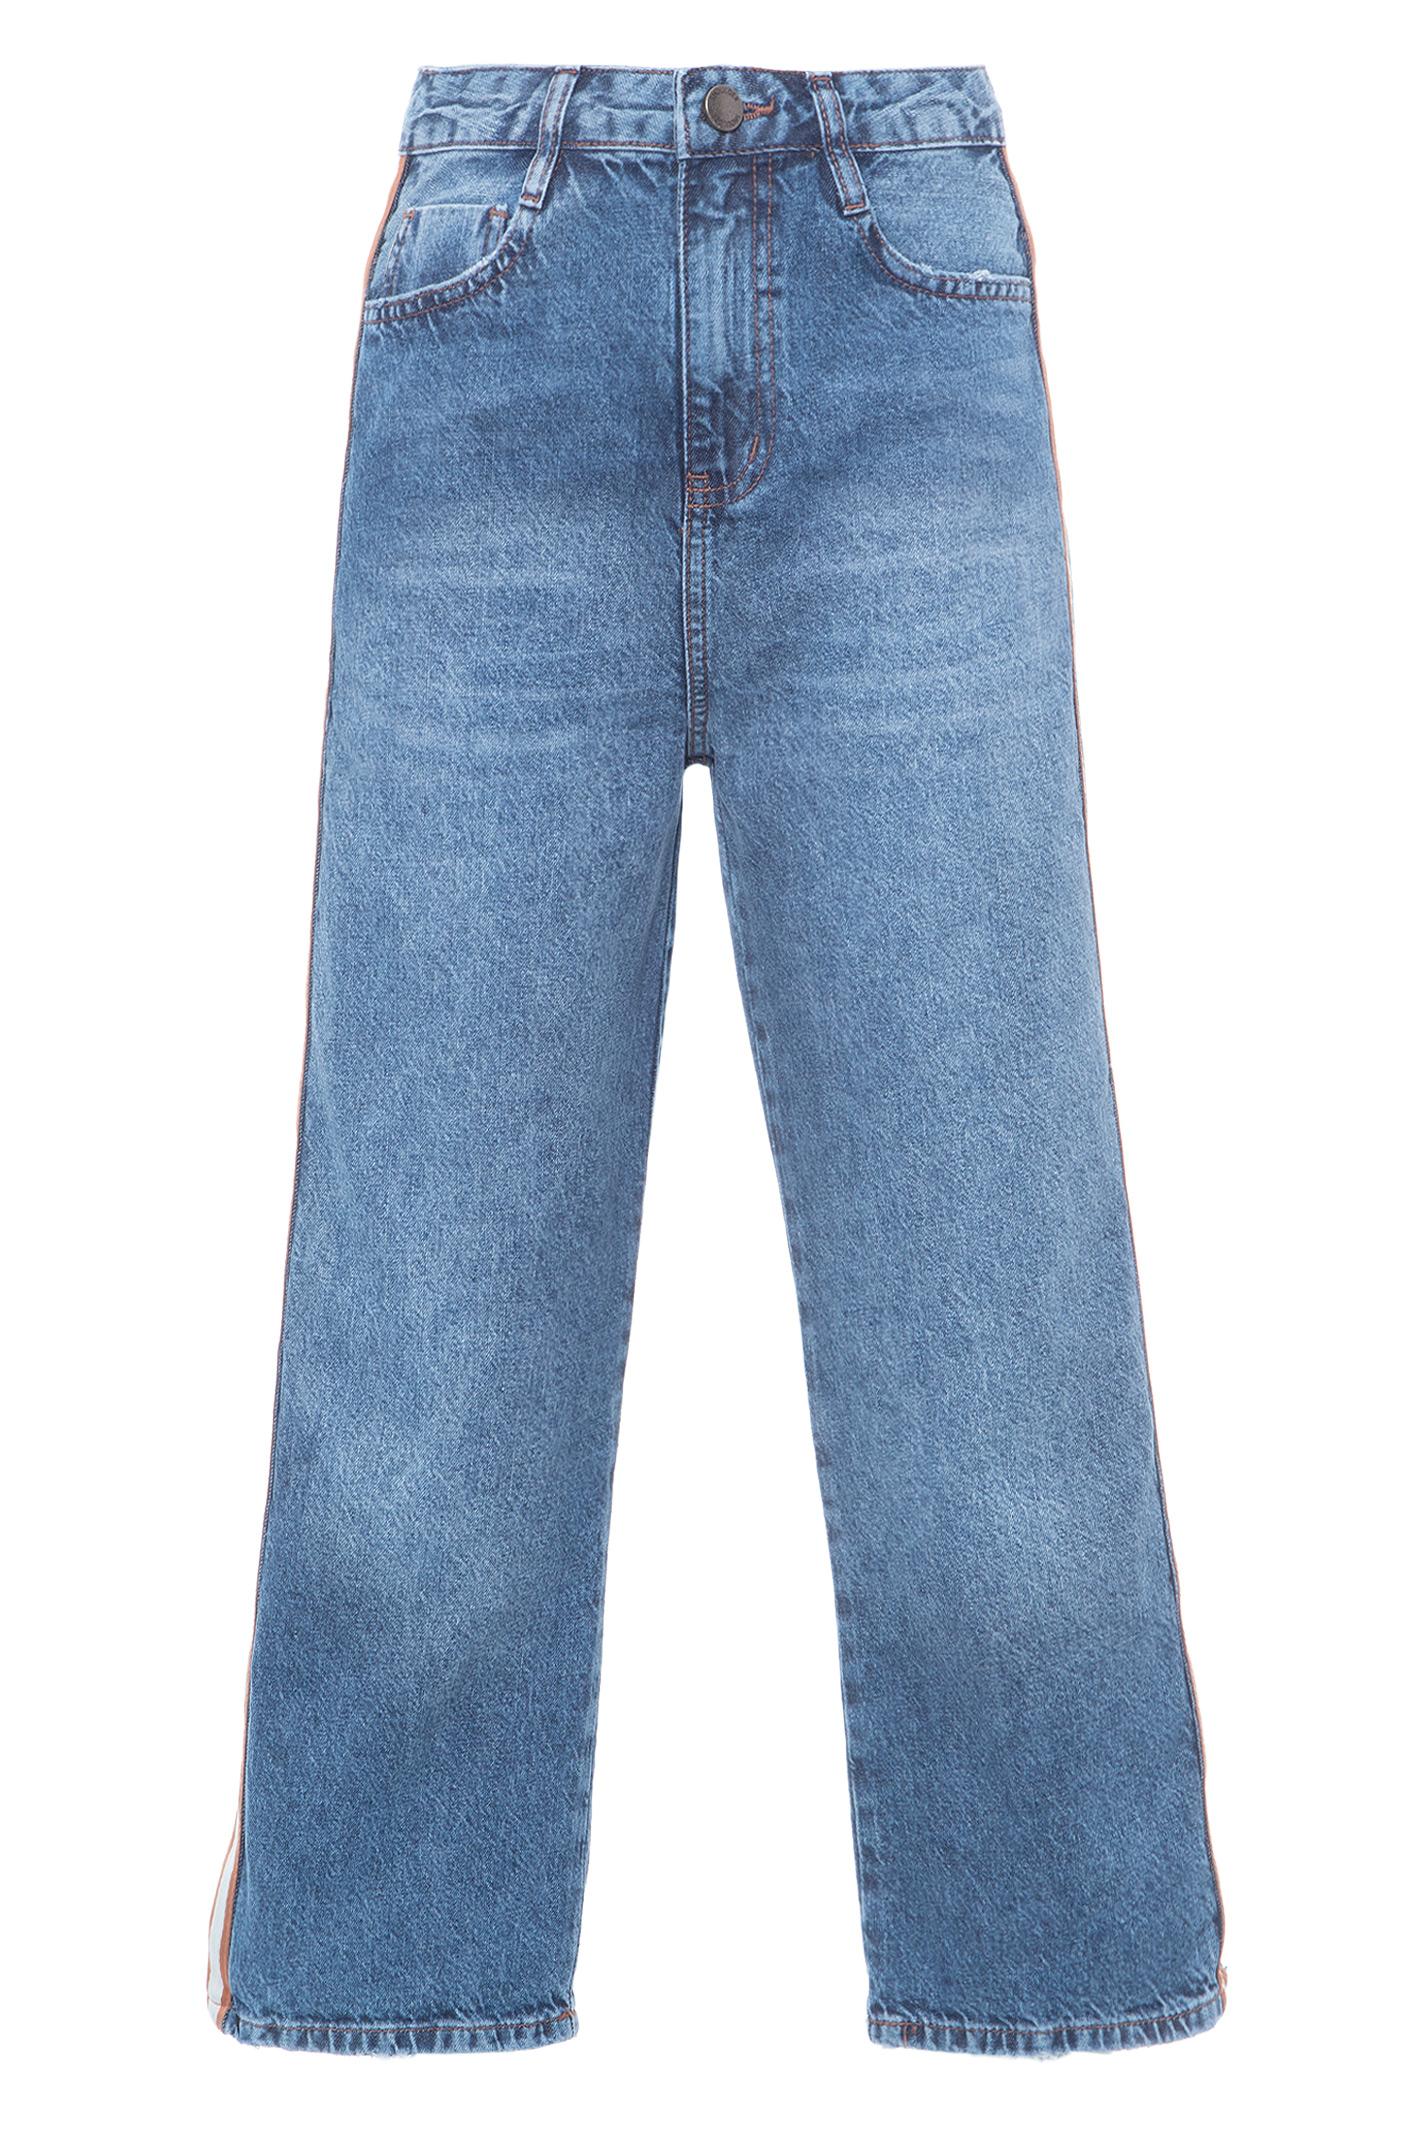 Calca Jeans Cropped Faixa Lateral